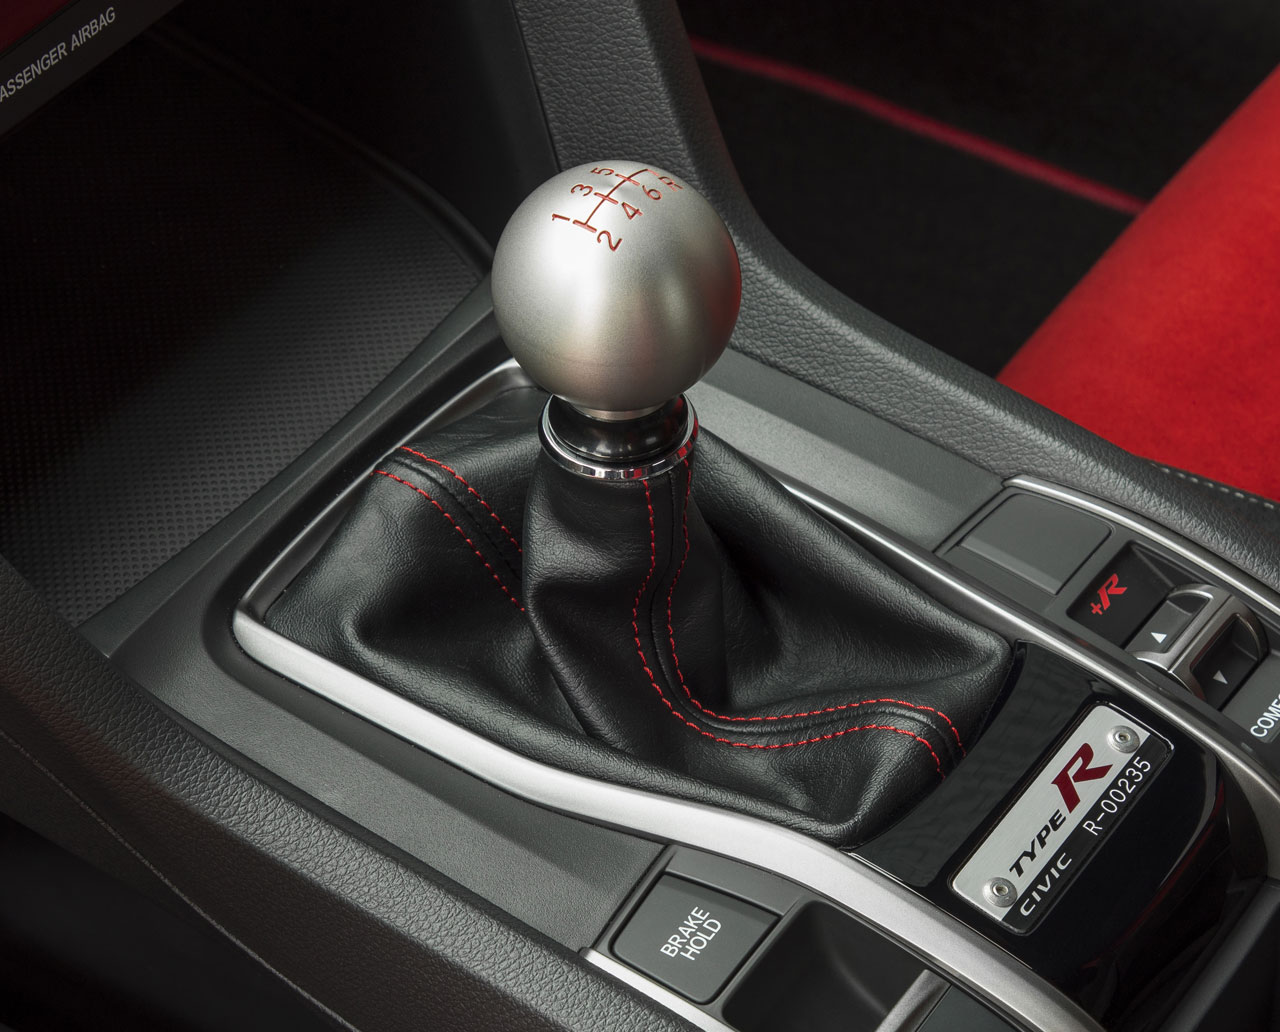 Jdm Fk8 Civic Type R 6 Speed Shift Knob Bronze